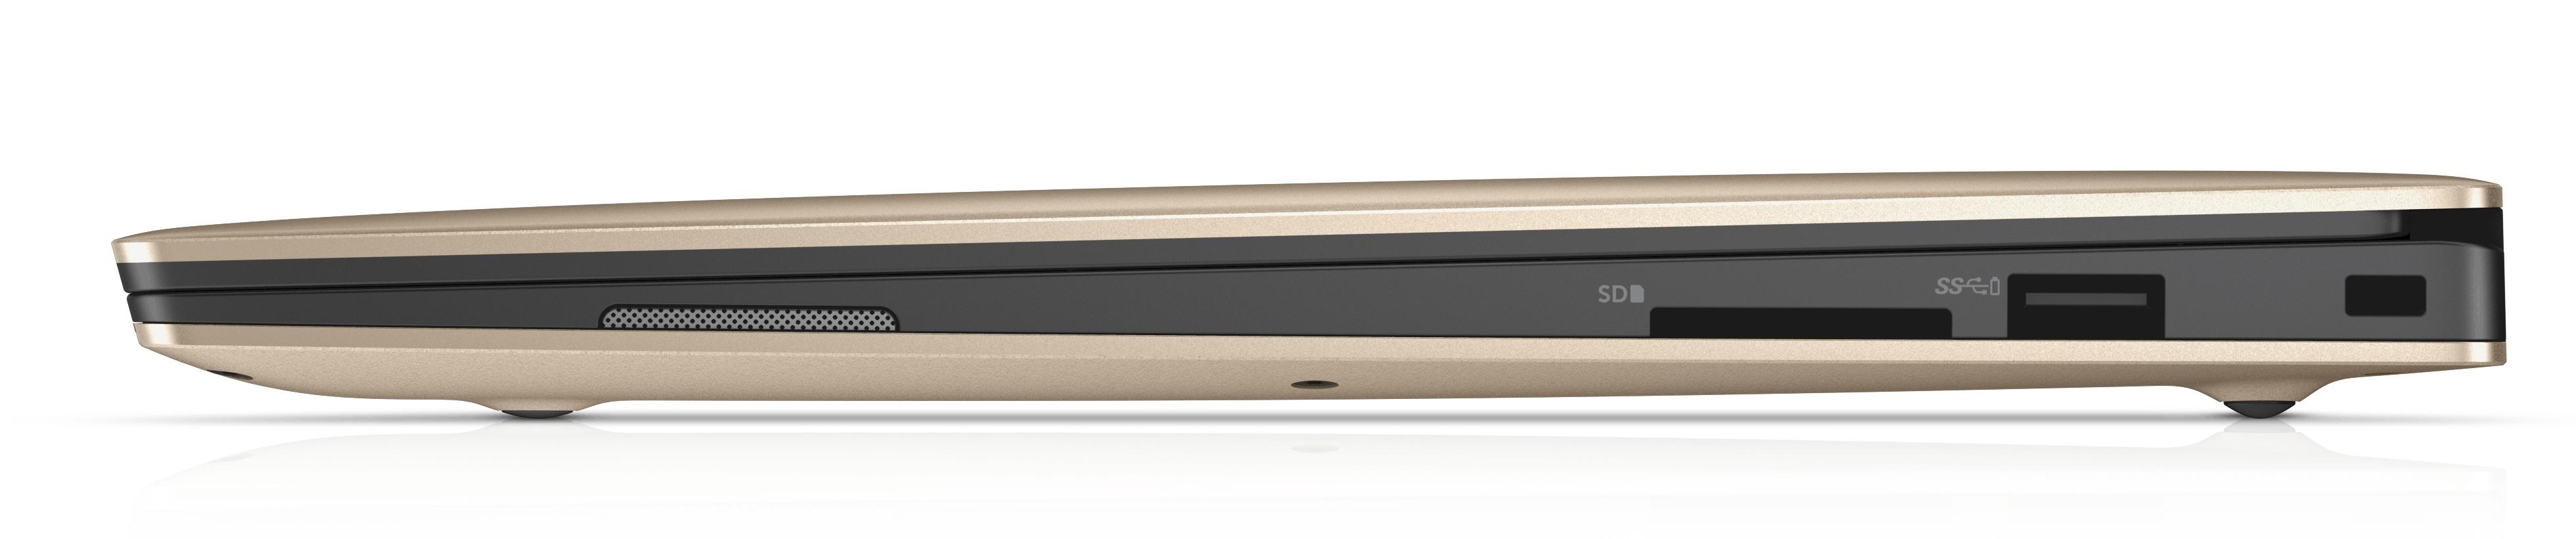 Produktdaten DELL XPS 13 9360 Gold Notebook 33,8 cm (13.3